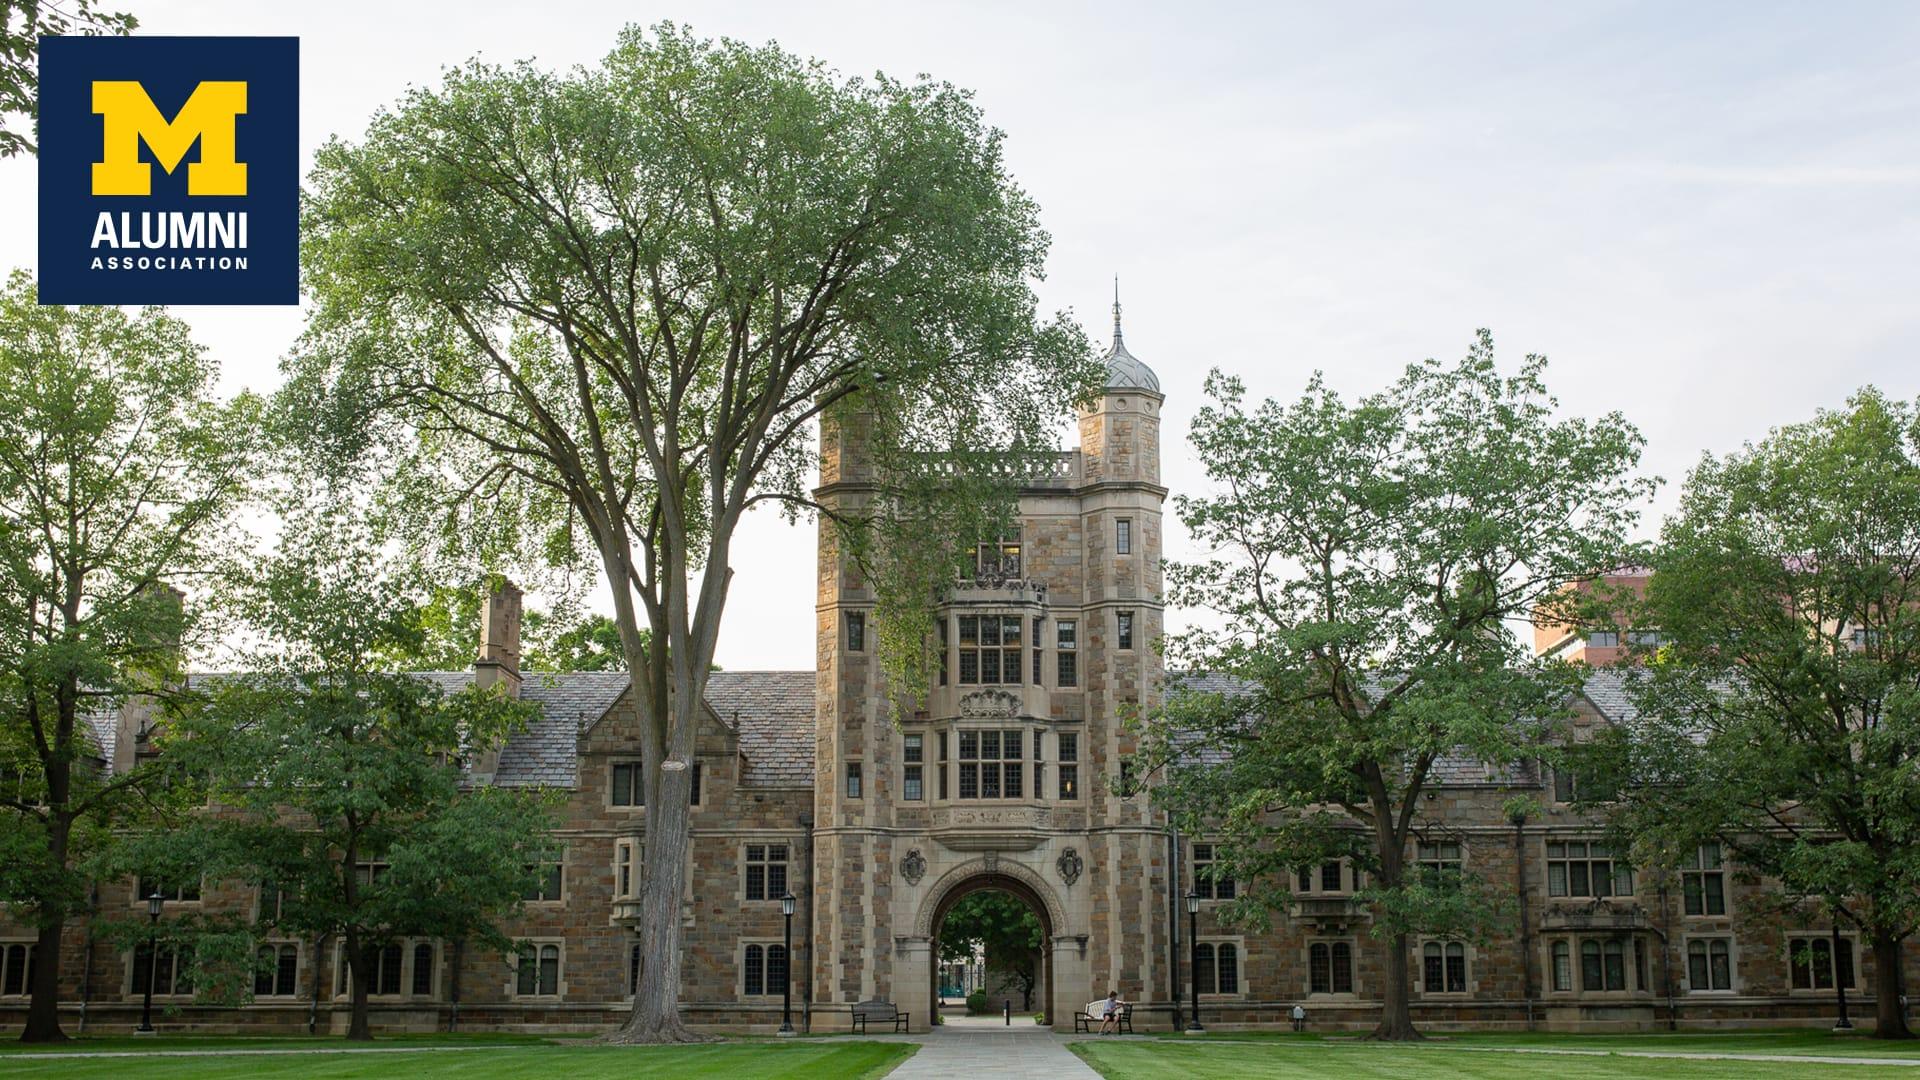 University of Michigan Law Quad with Alumni Association logo